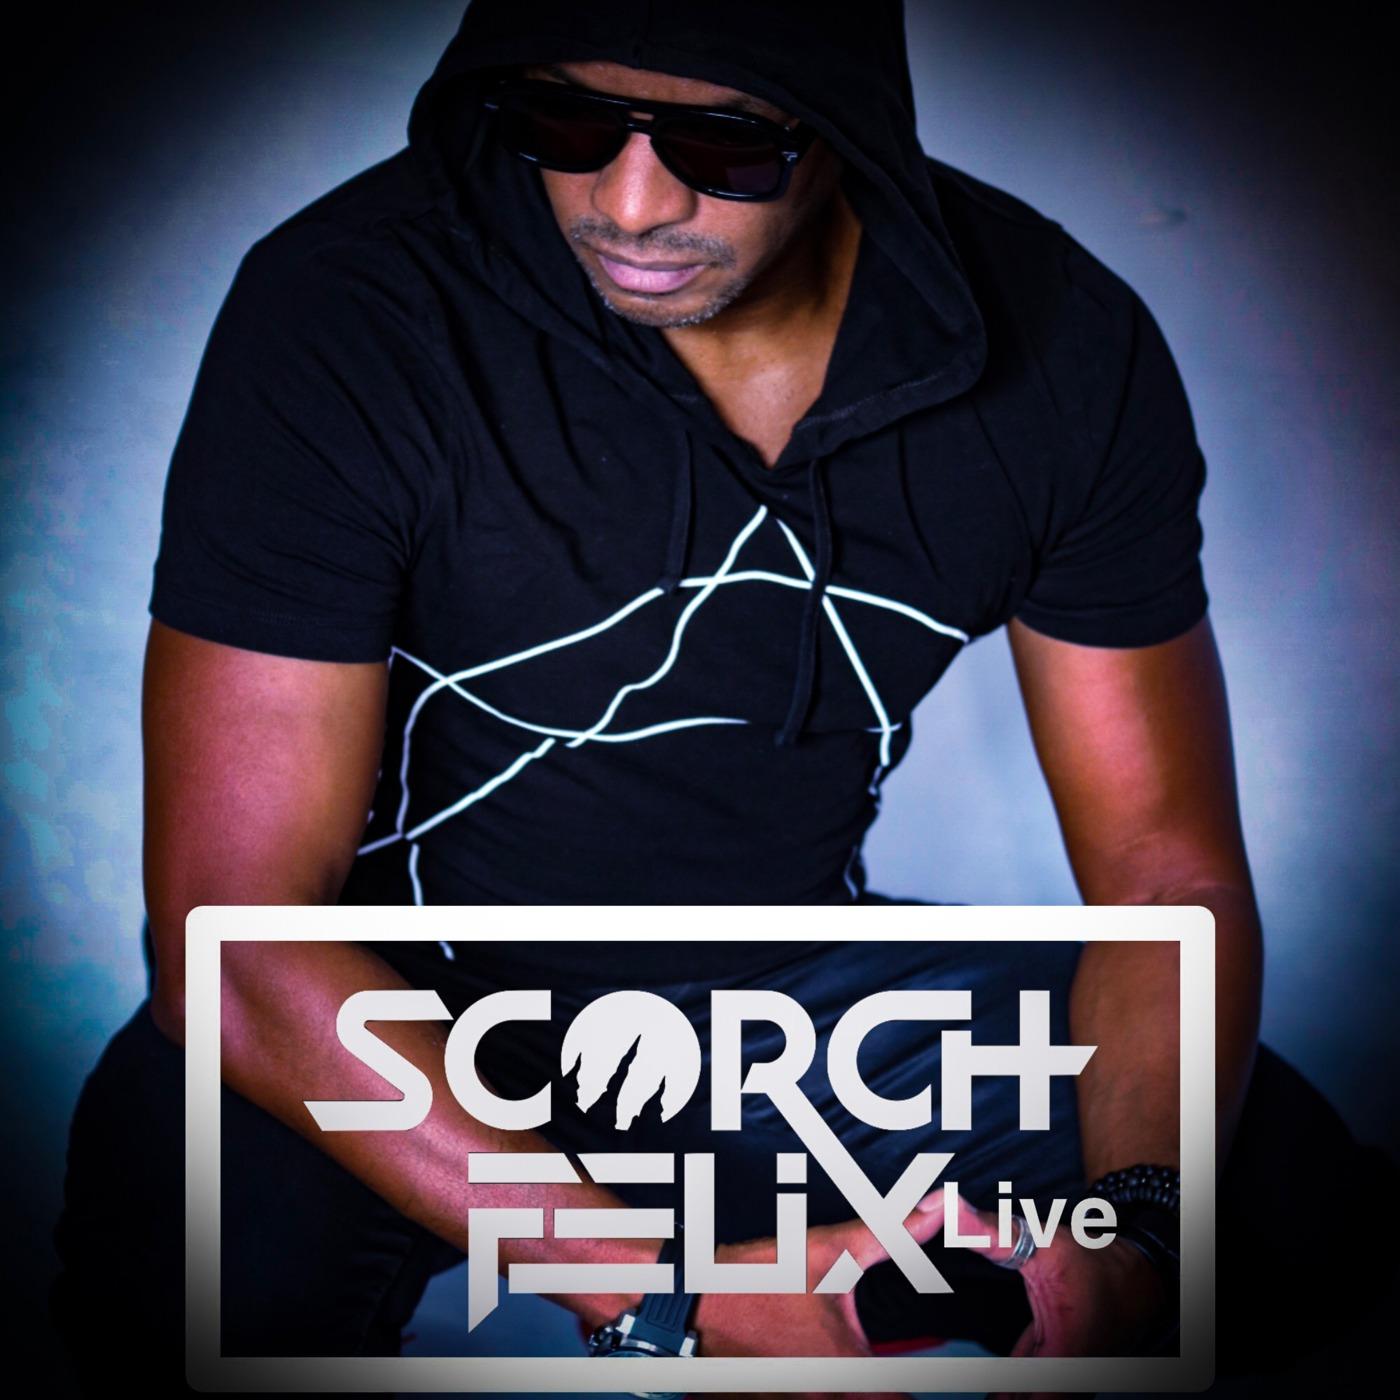 Scorch Felix Live